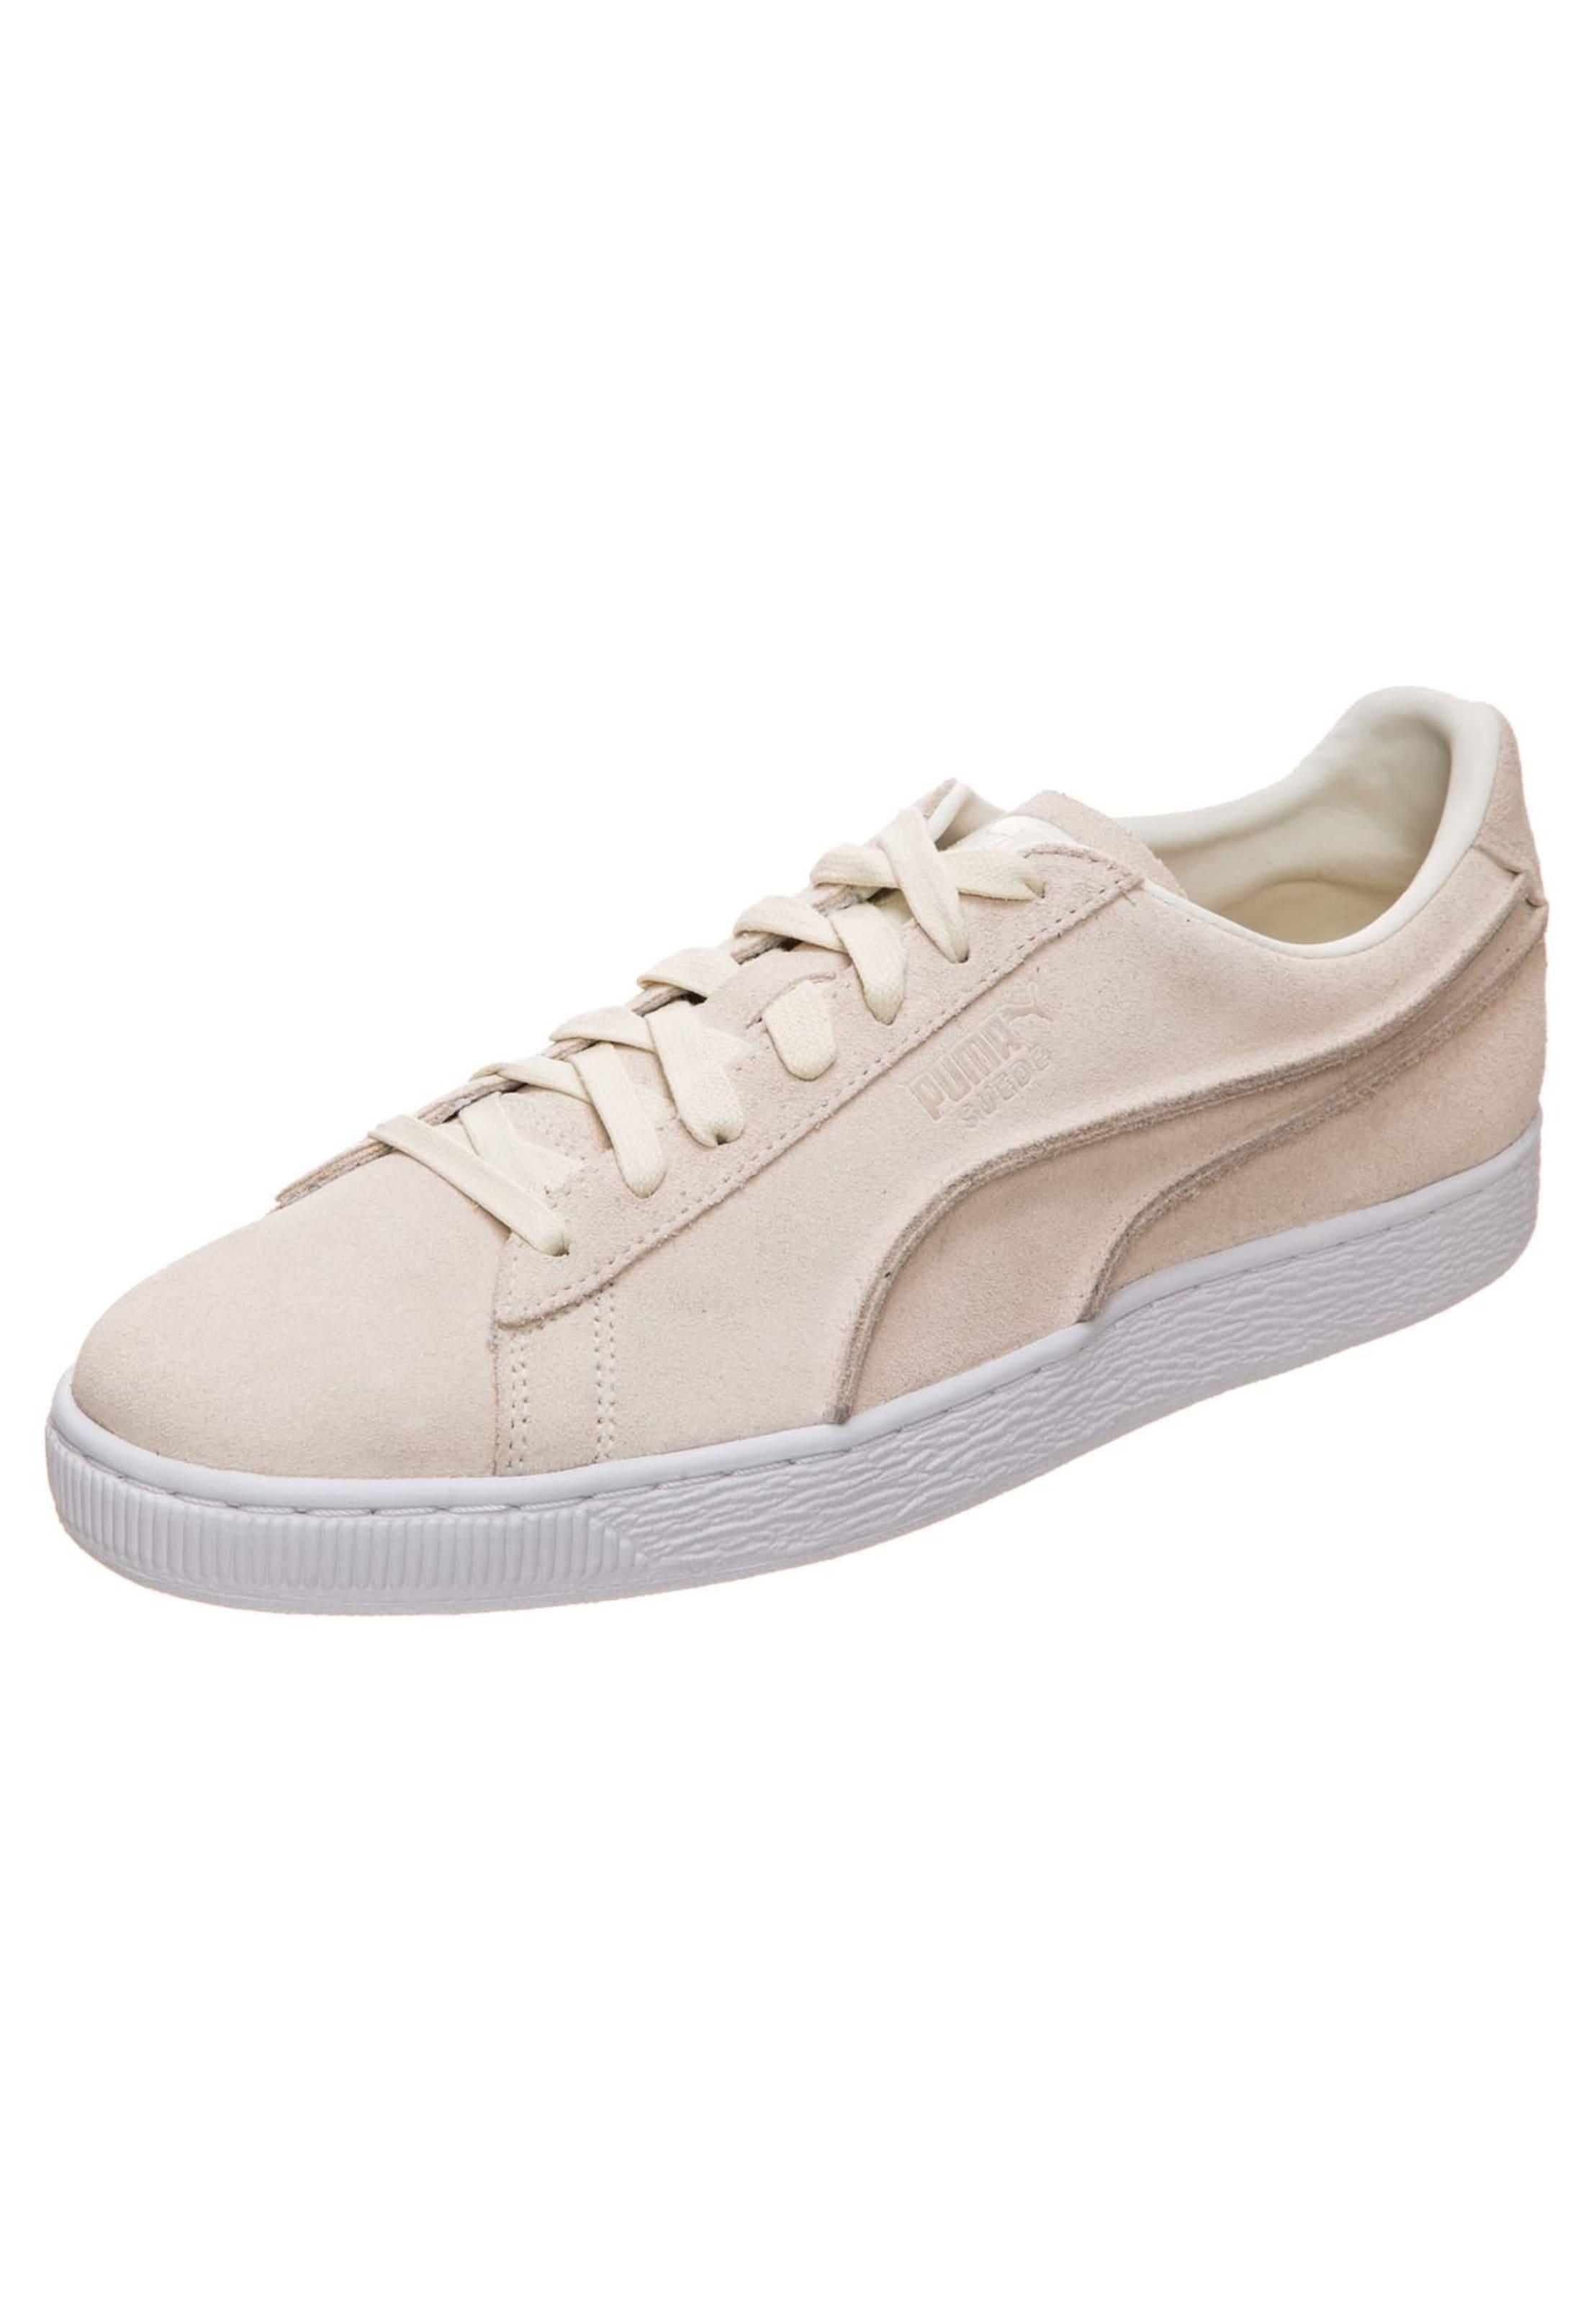 PUMA    Suede Sneaker Classic Exposed Seams  Sneaker Suede 8a53f5